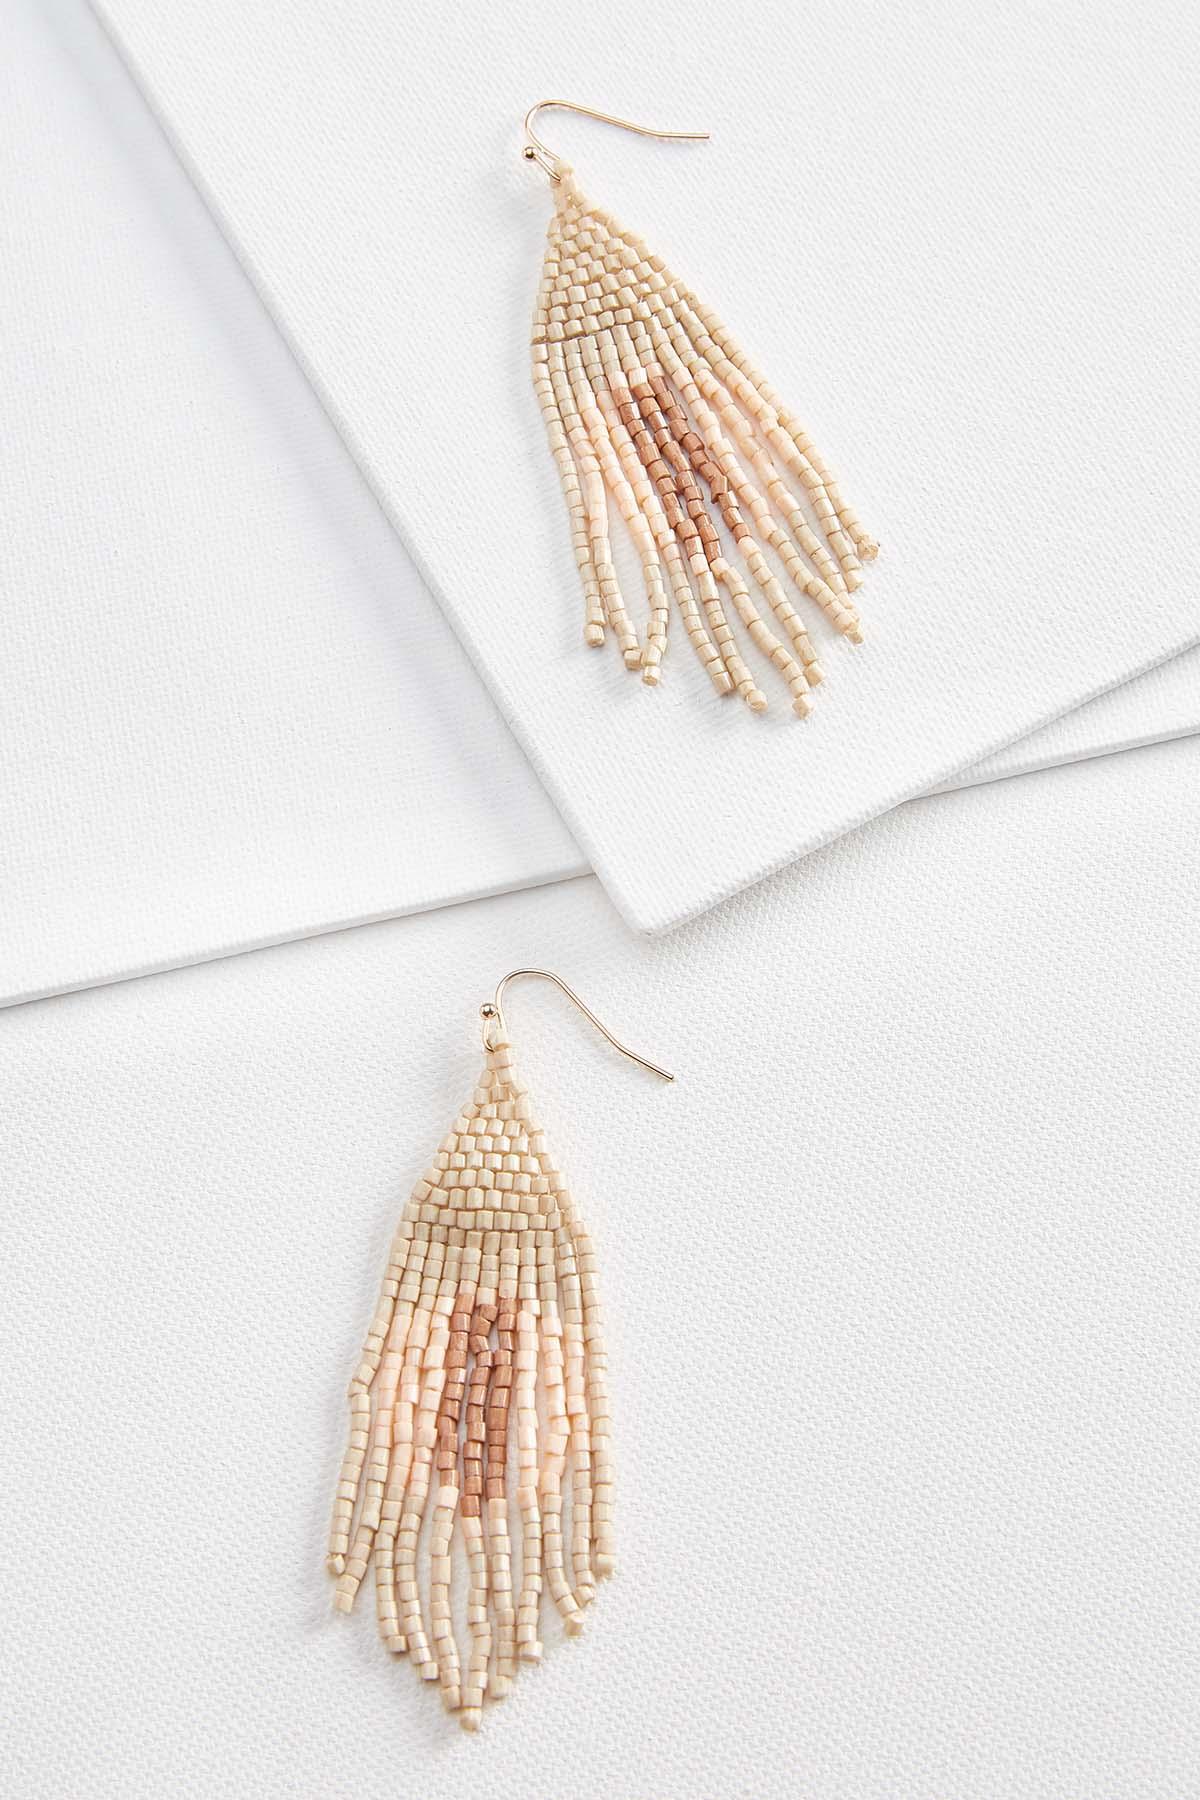 Neutral Fringed Earrings